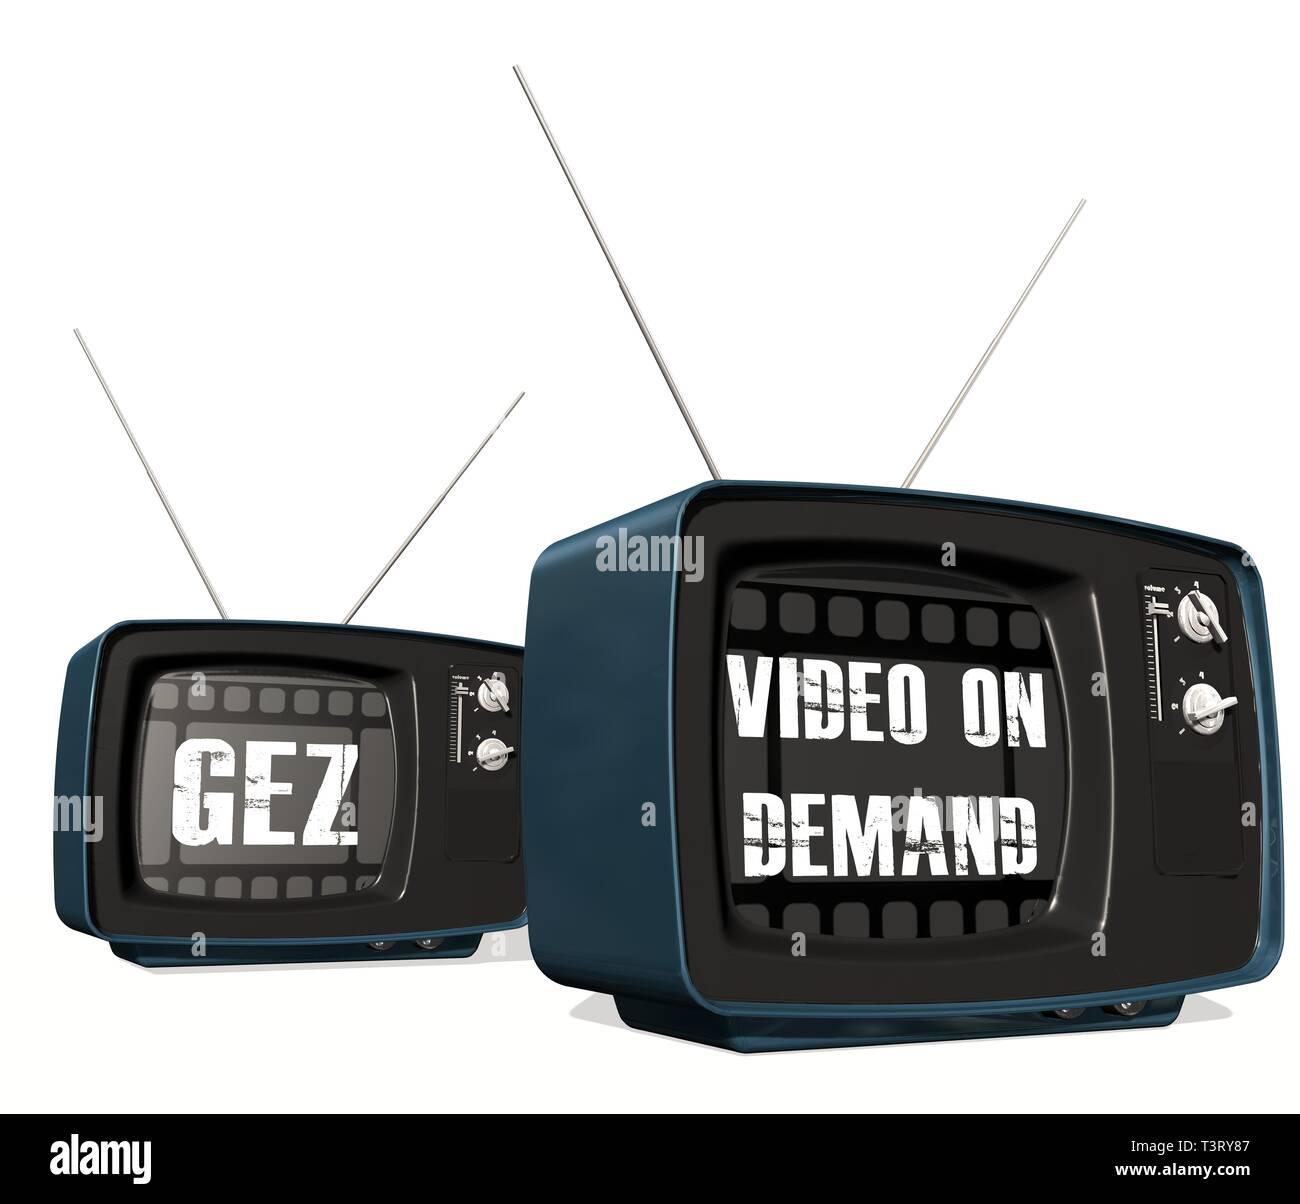 Retro old TV receiver - GEZ vs. Video on Demand - Stock Image